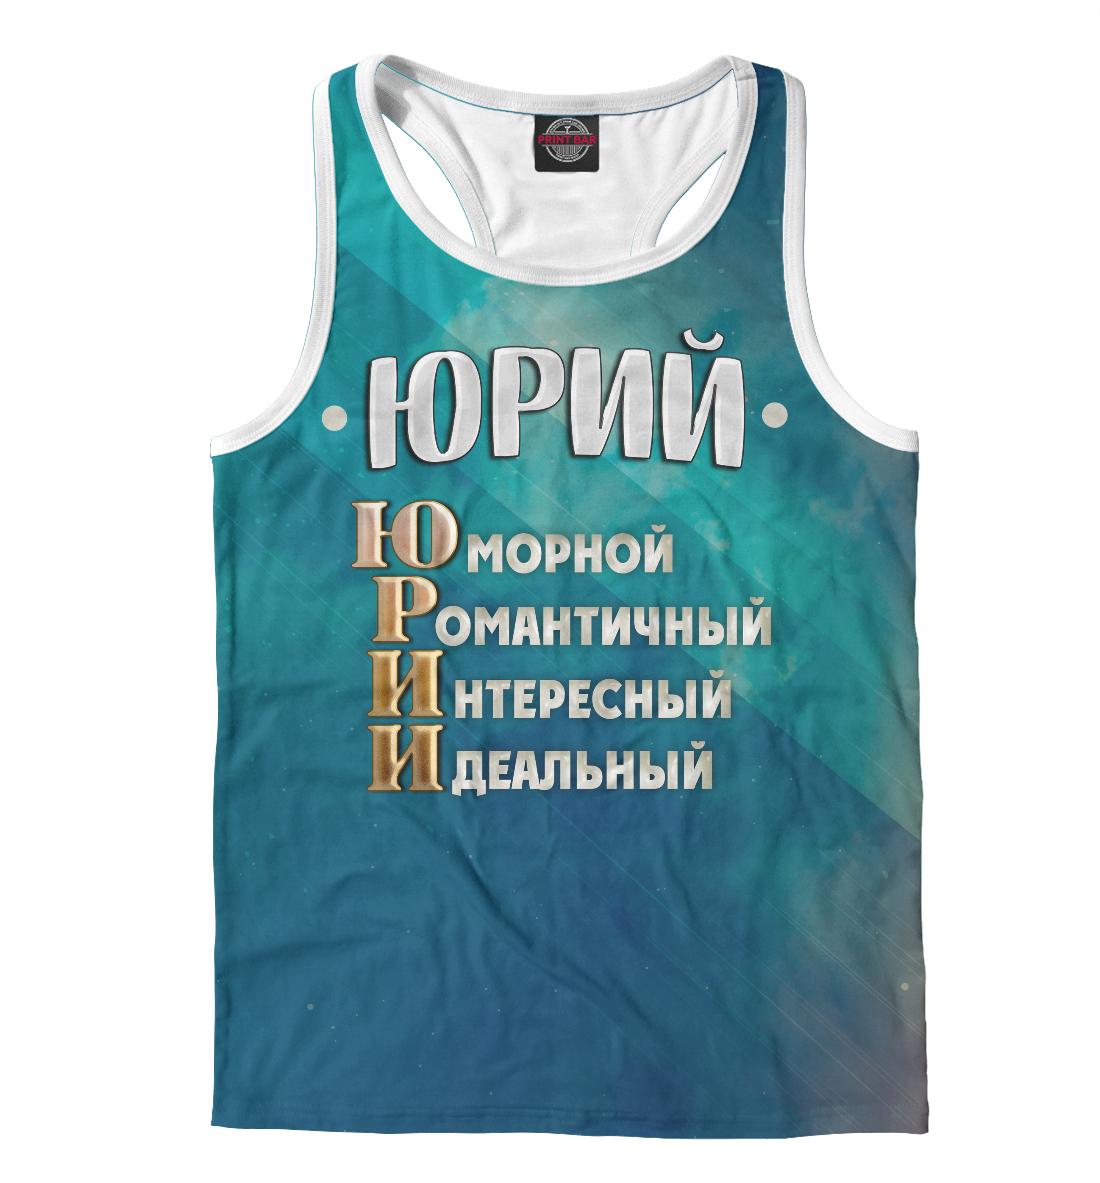 Купить Комплименты Юрий, Printbar, Майки борцовки, IMR-709281-mayb-2